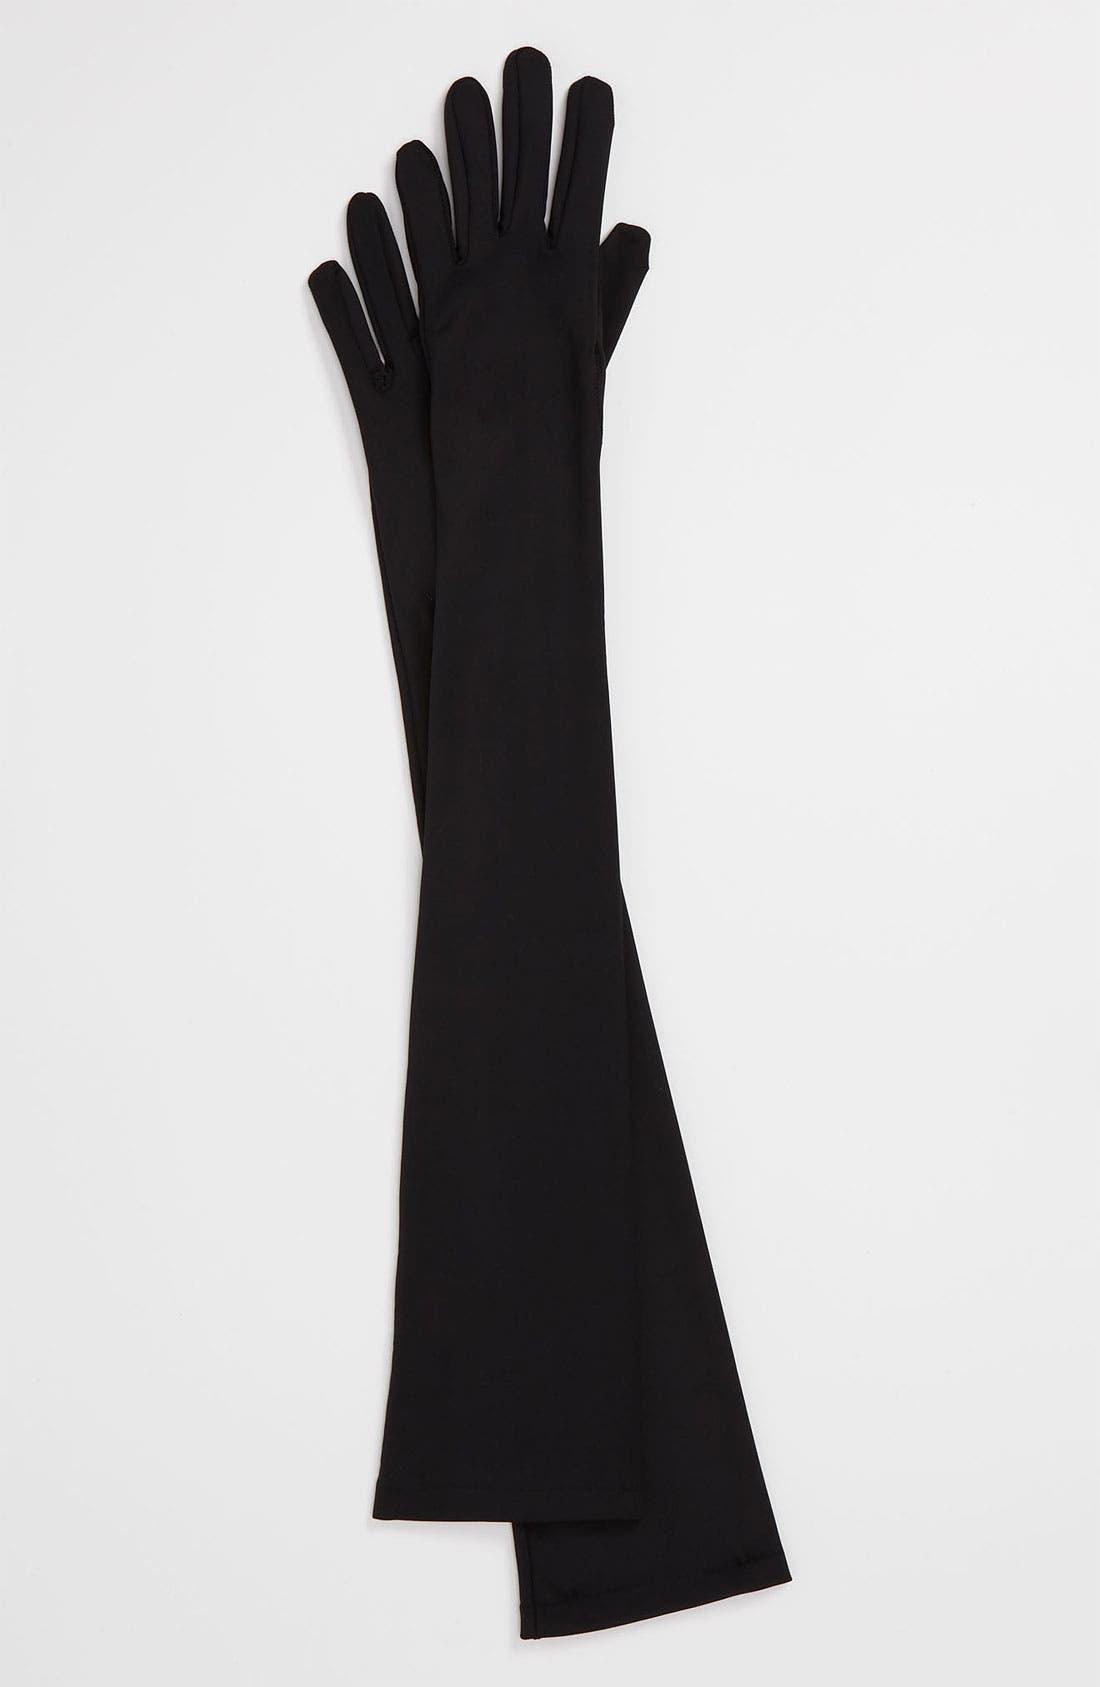 Alternate Image 1 Selected - Finale Opera Length Gloves